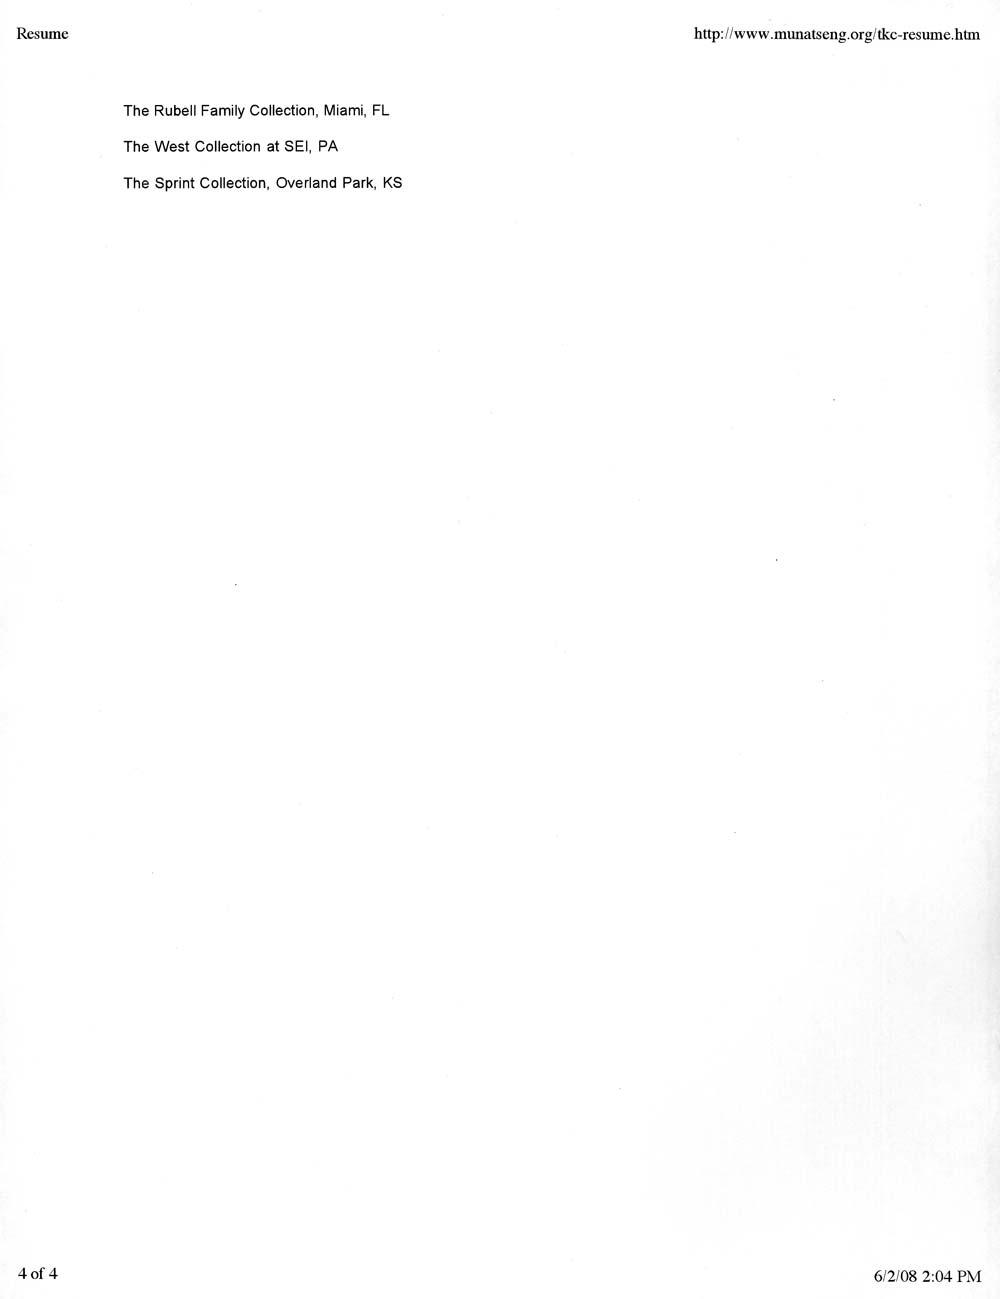 Tseng Kwong Chi's Resume, pg 4